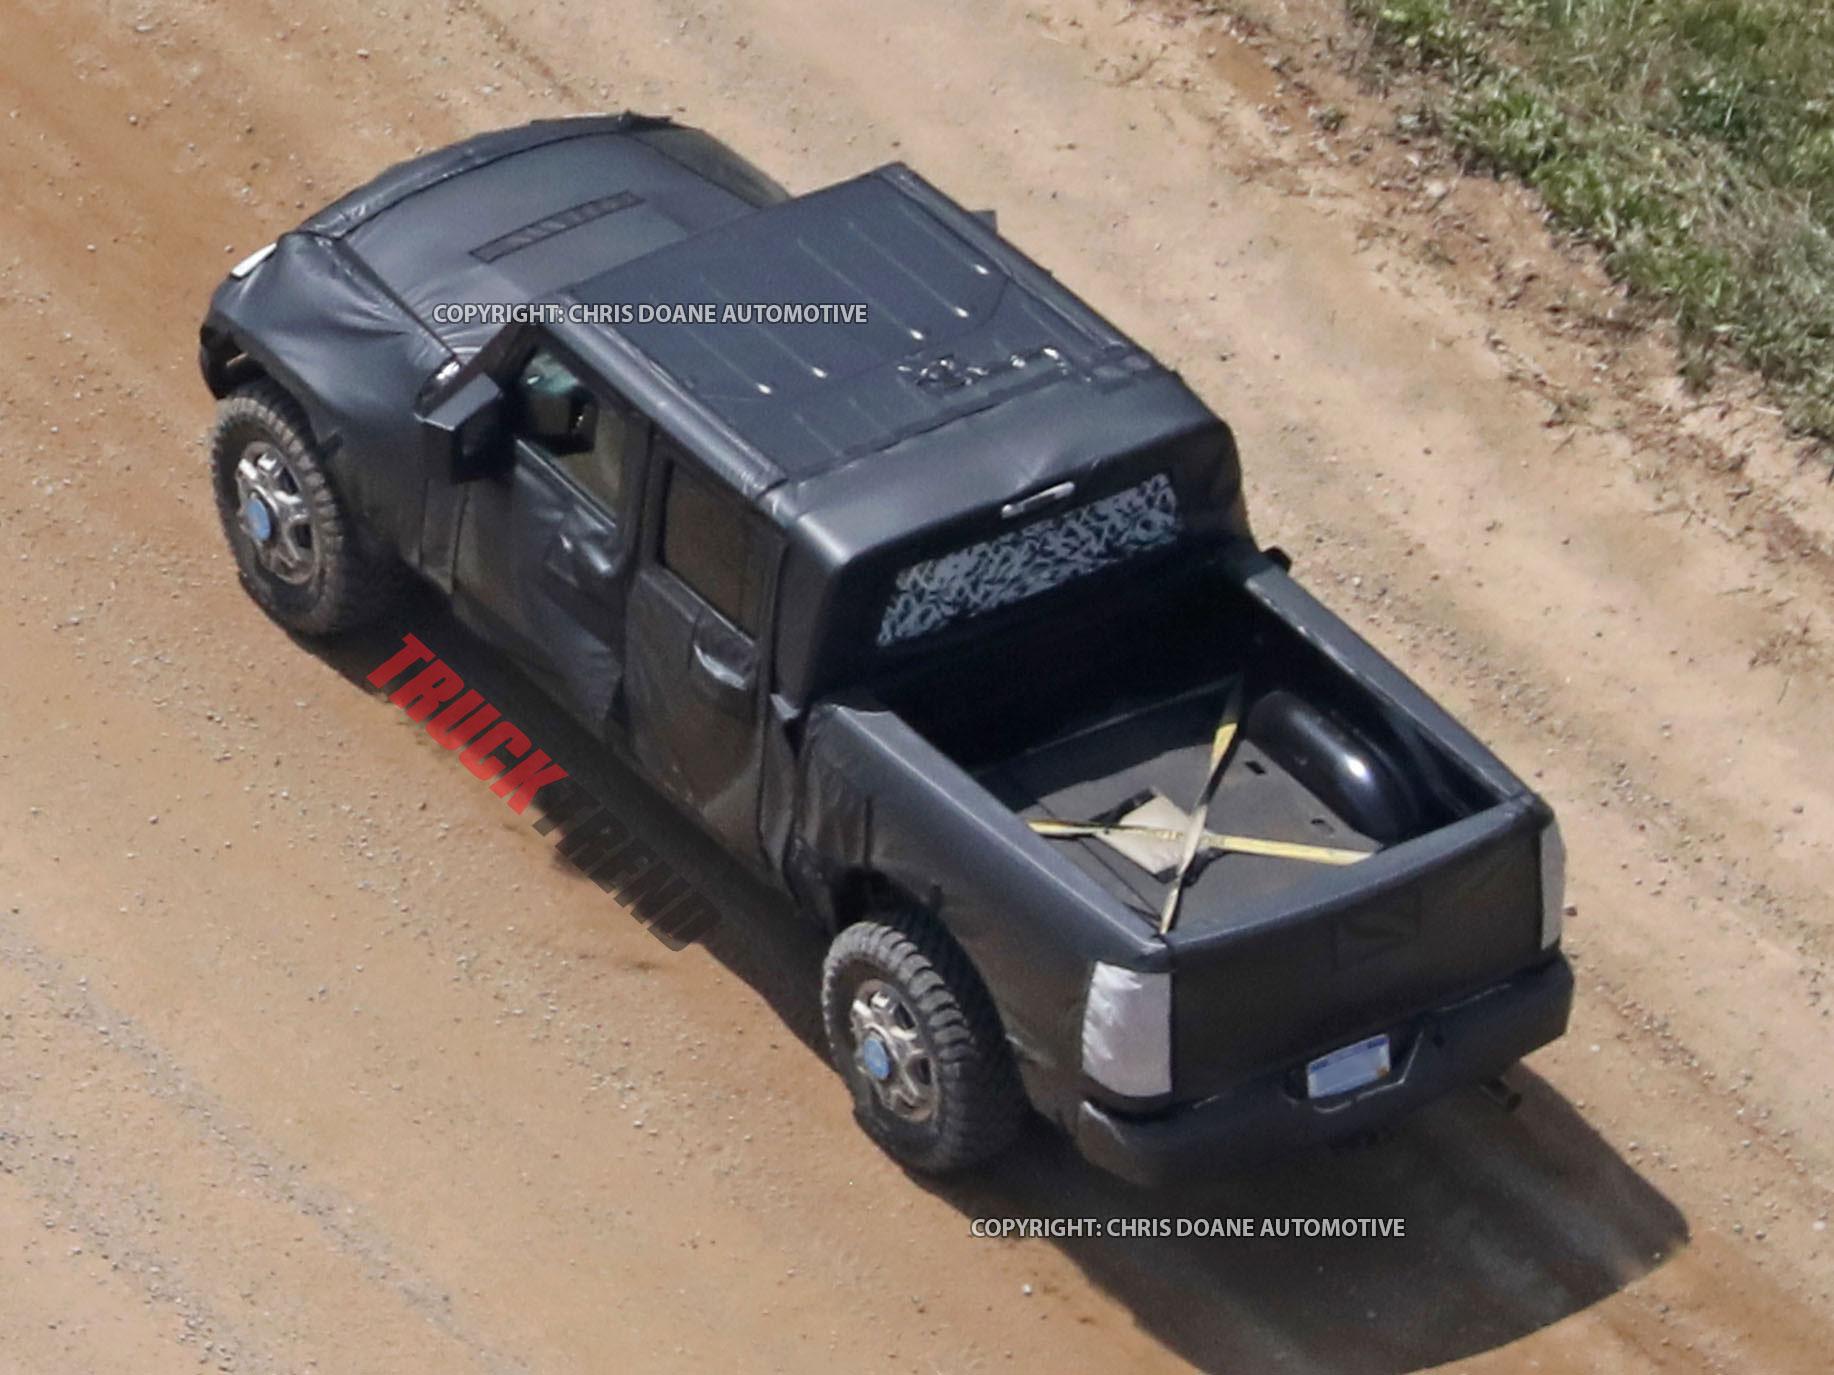 2019 Jeep Wrangler JL Pickup Spyshots 14